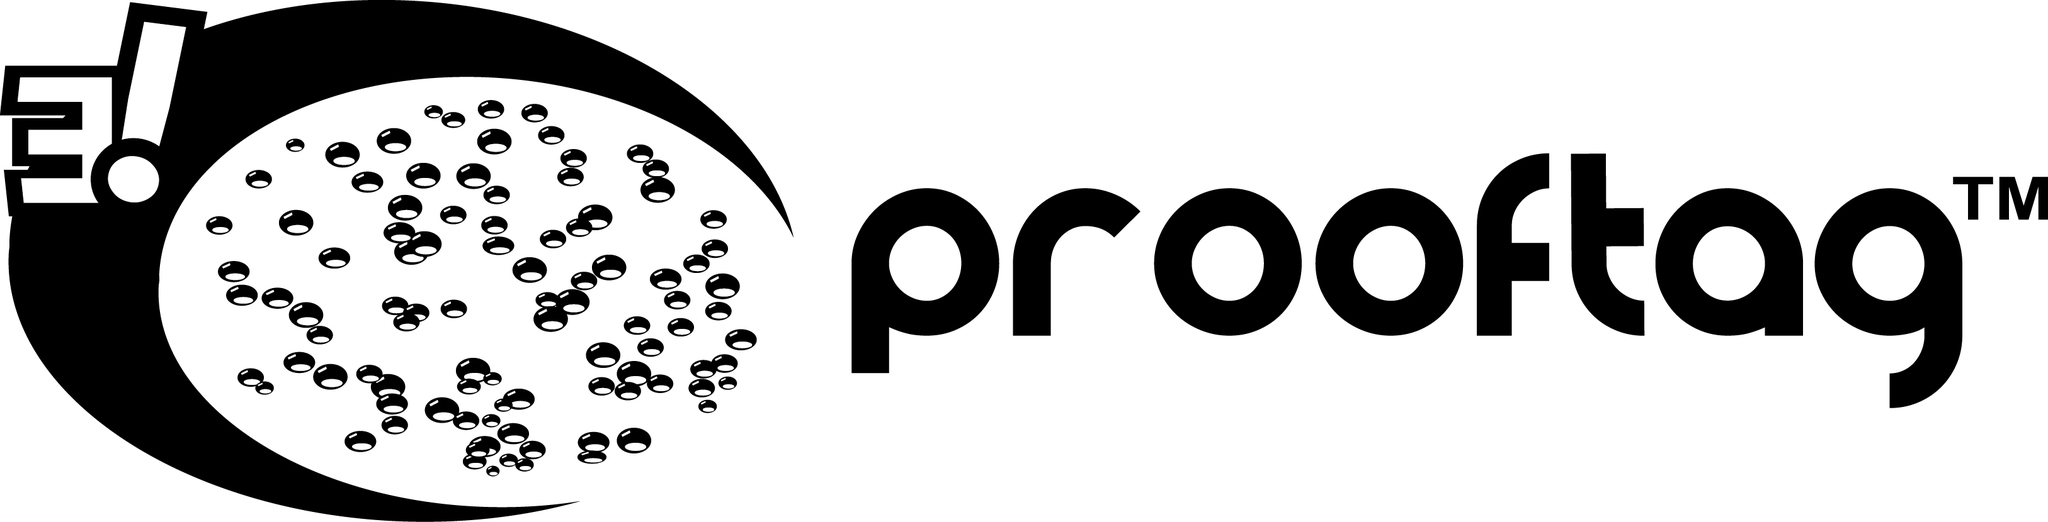 Prooftag